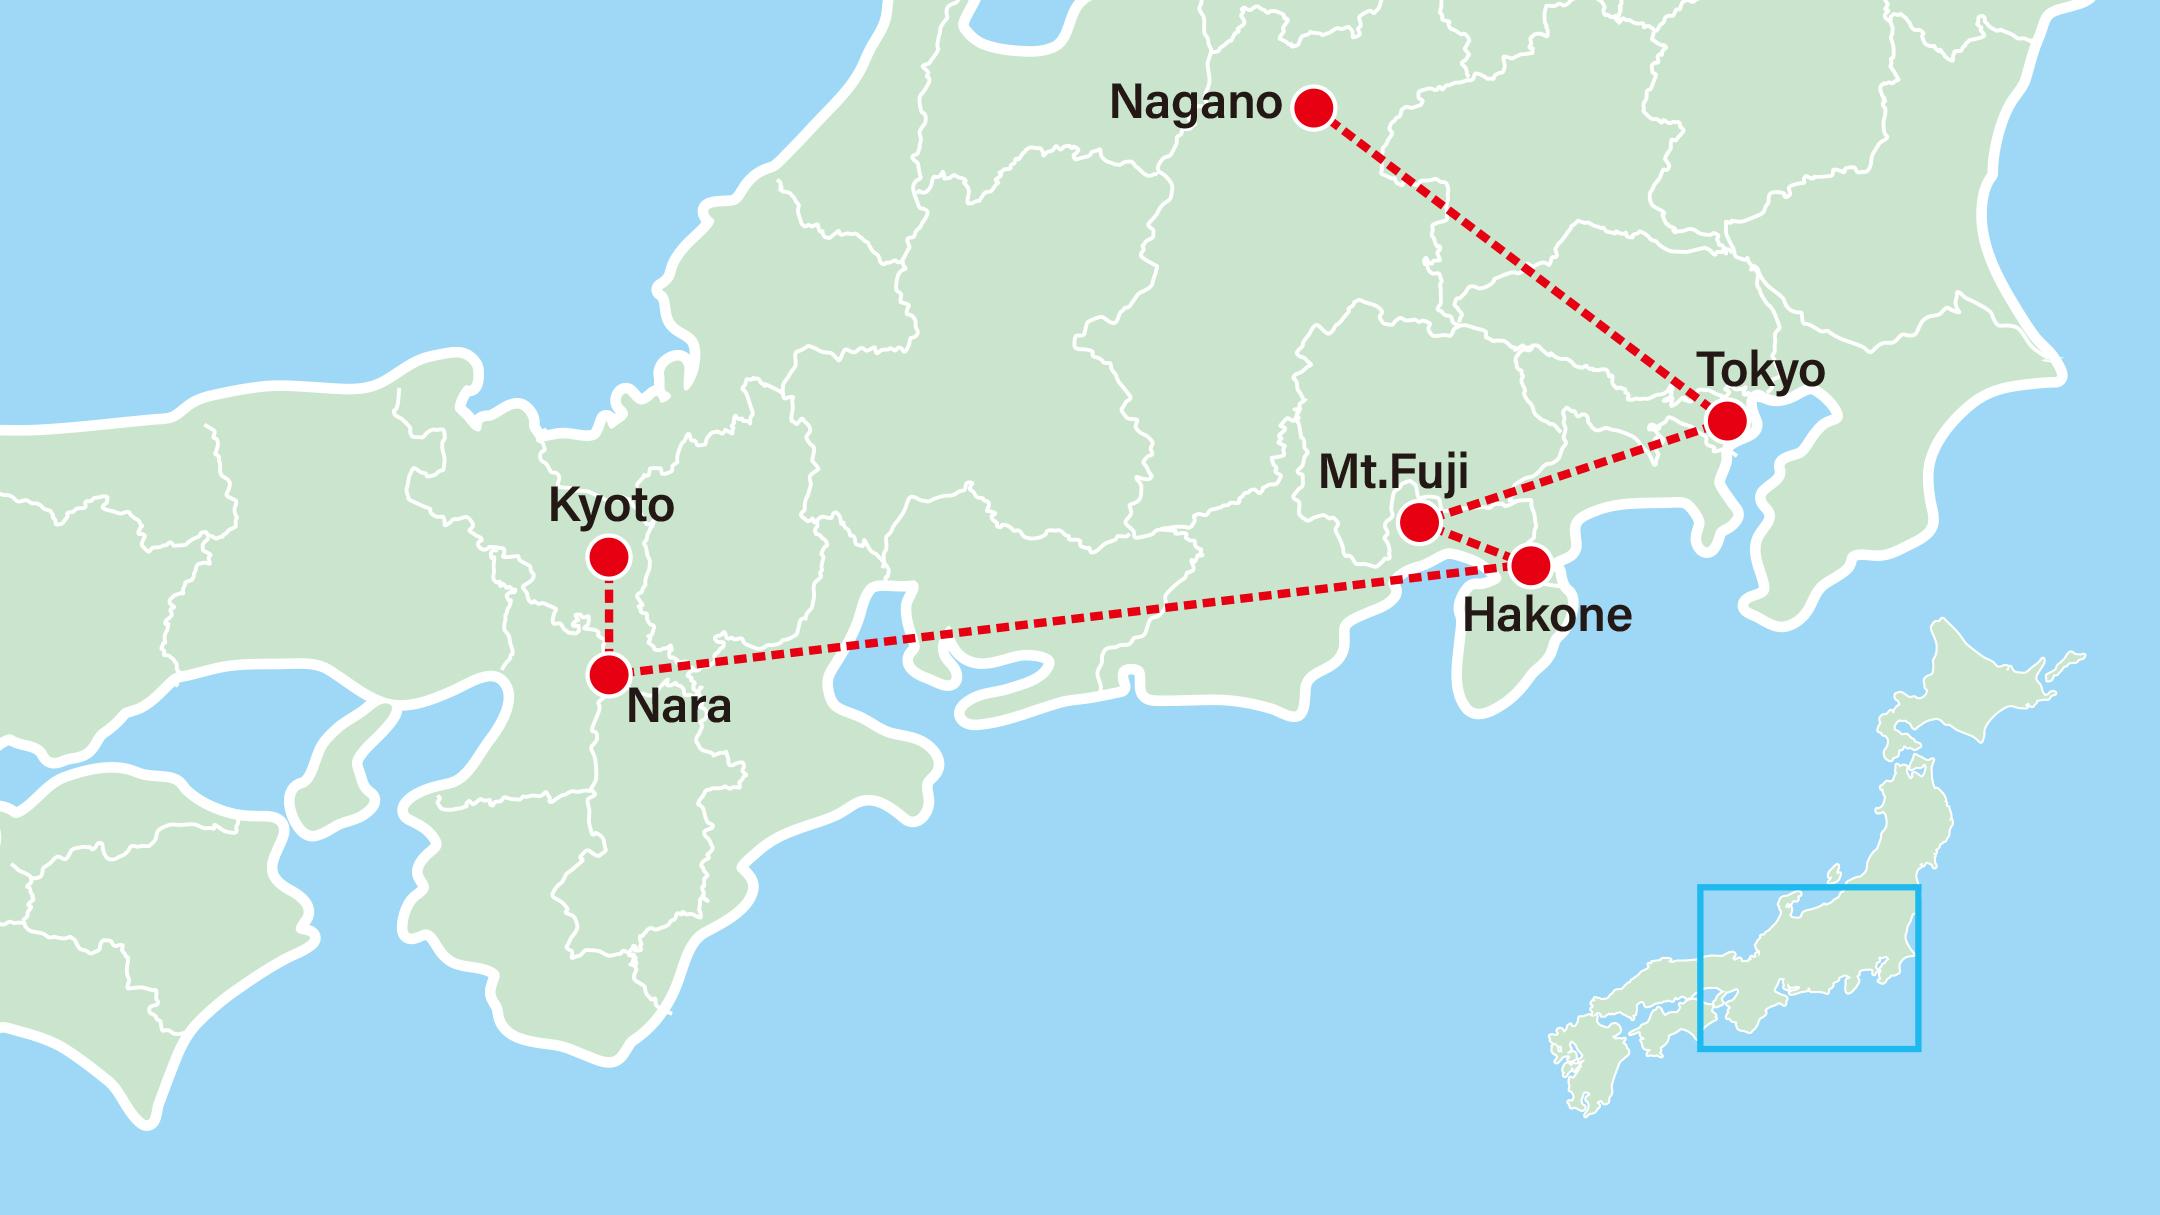 Winter Discovery - Snow Monkey 7 Days-Kyoto-Nara-Hakone-Tokyo-Nagano